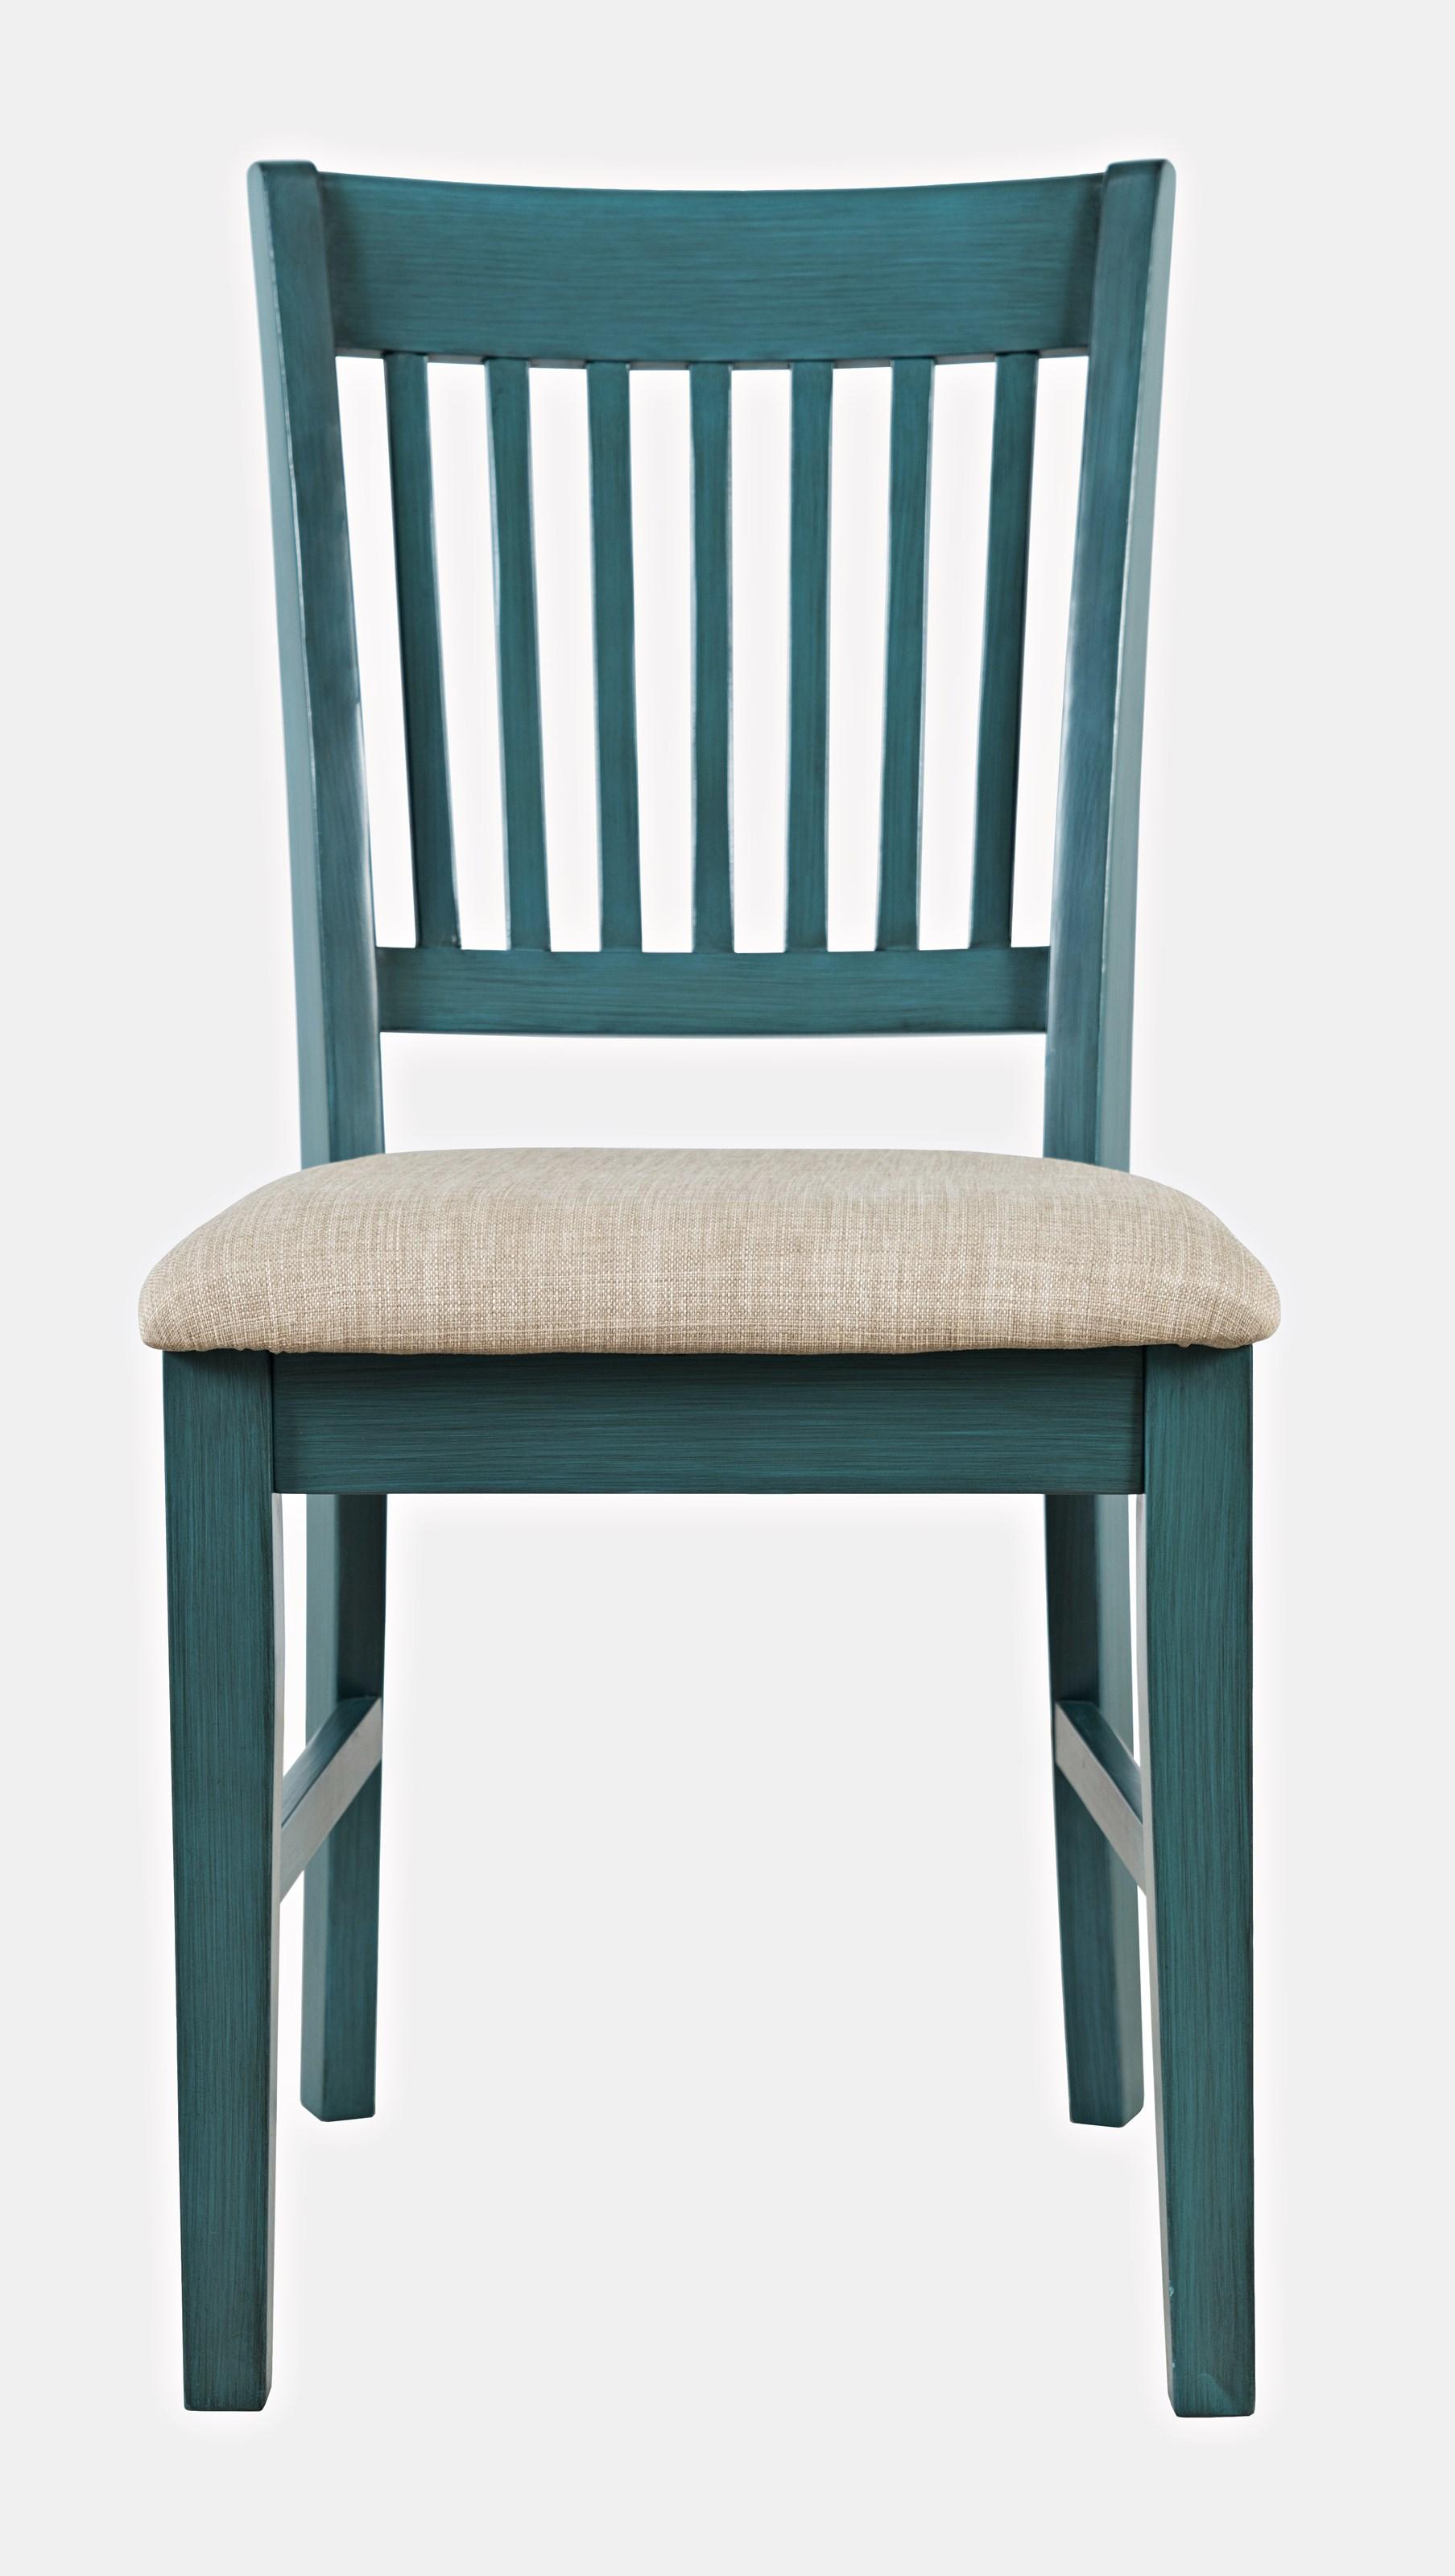 Craftsman Desk Chair by Jofran at Crowley Furniture & Mattress